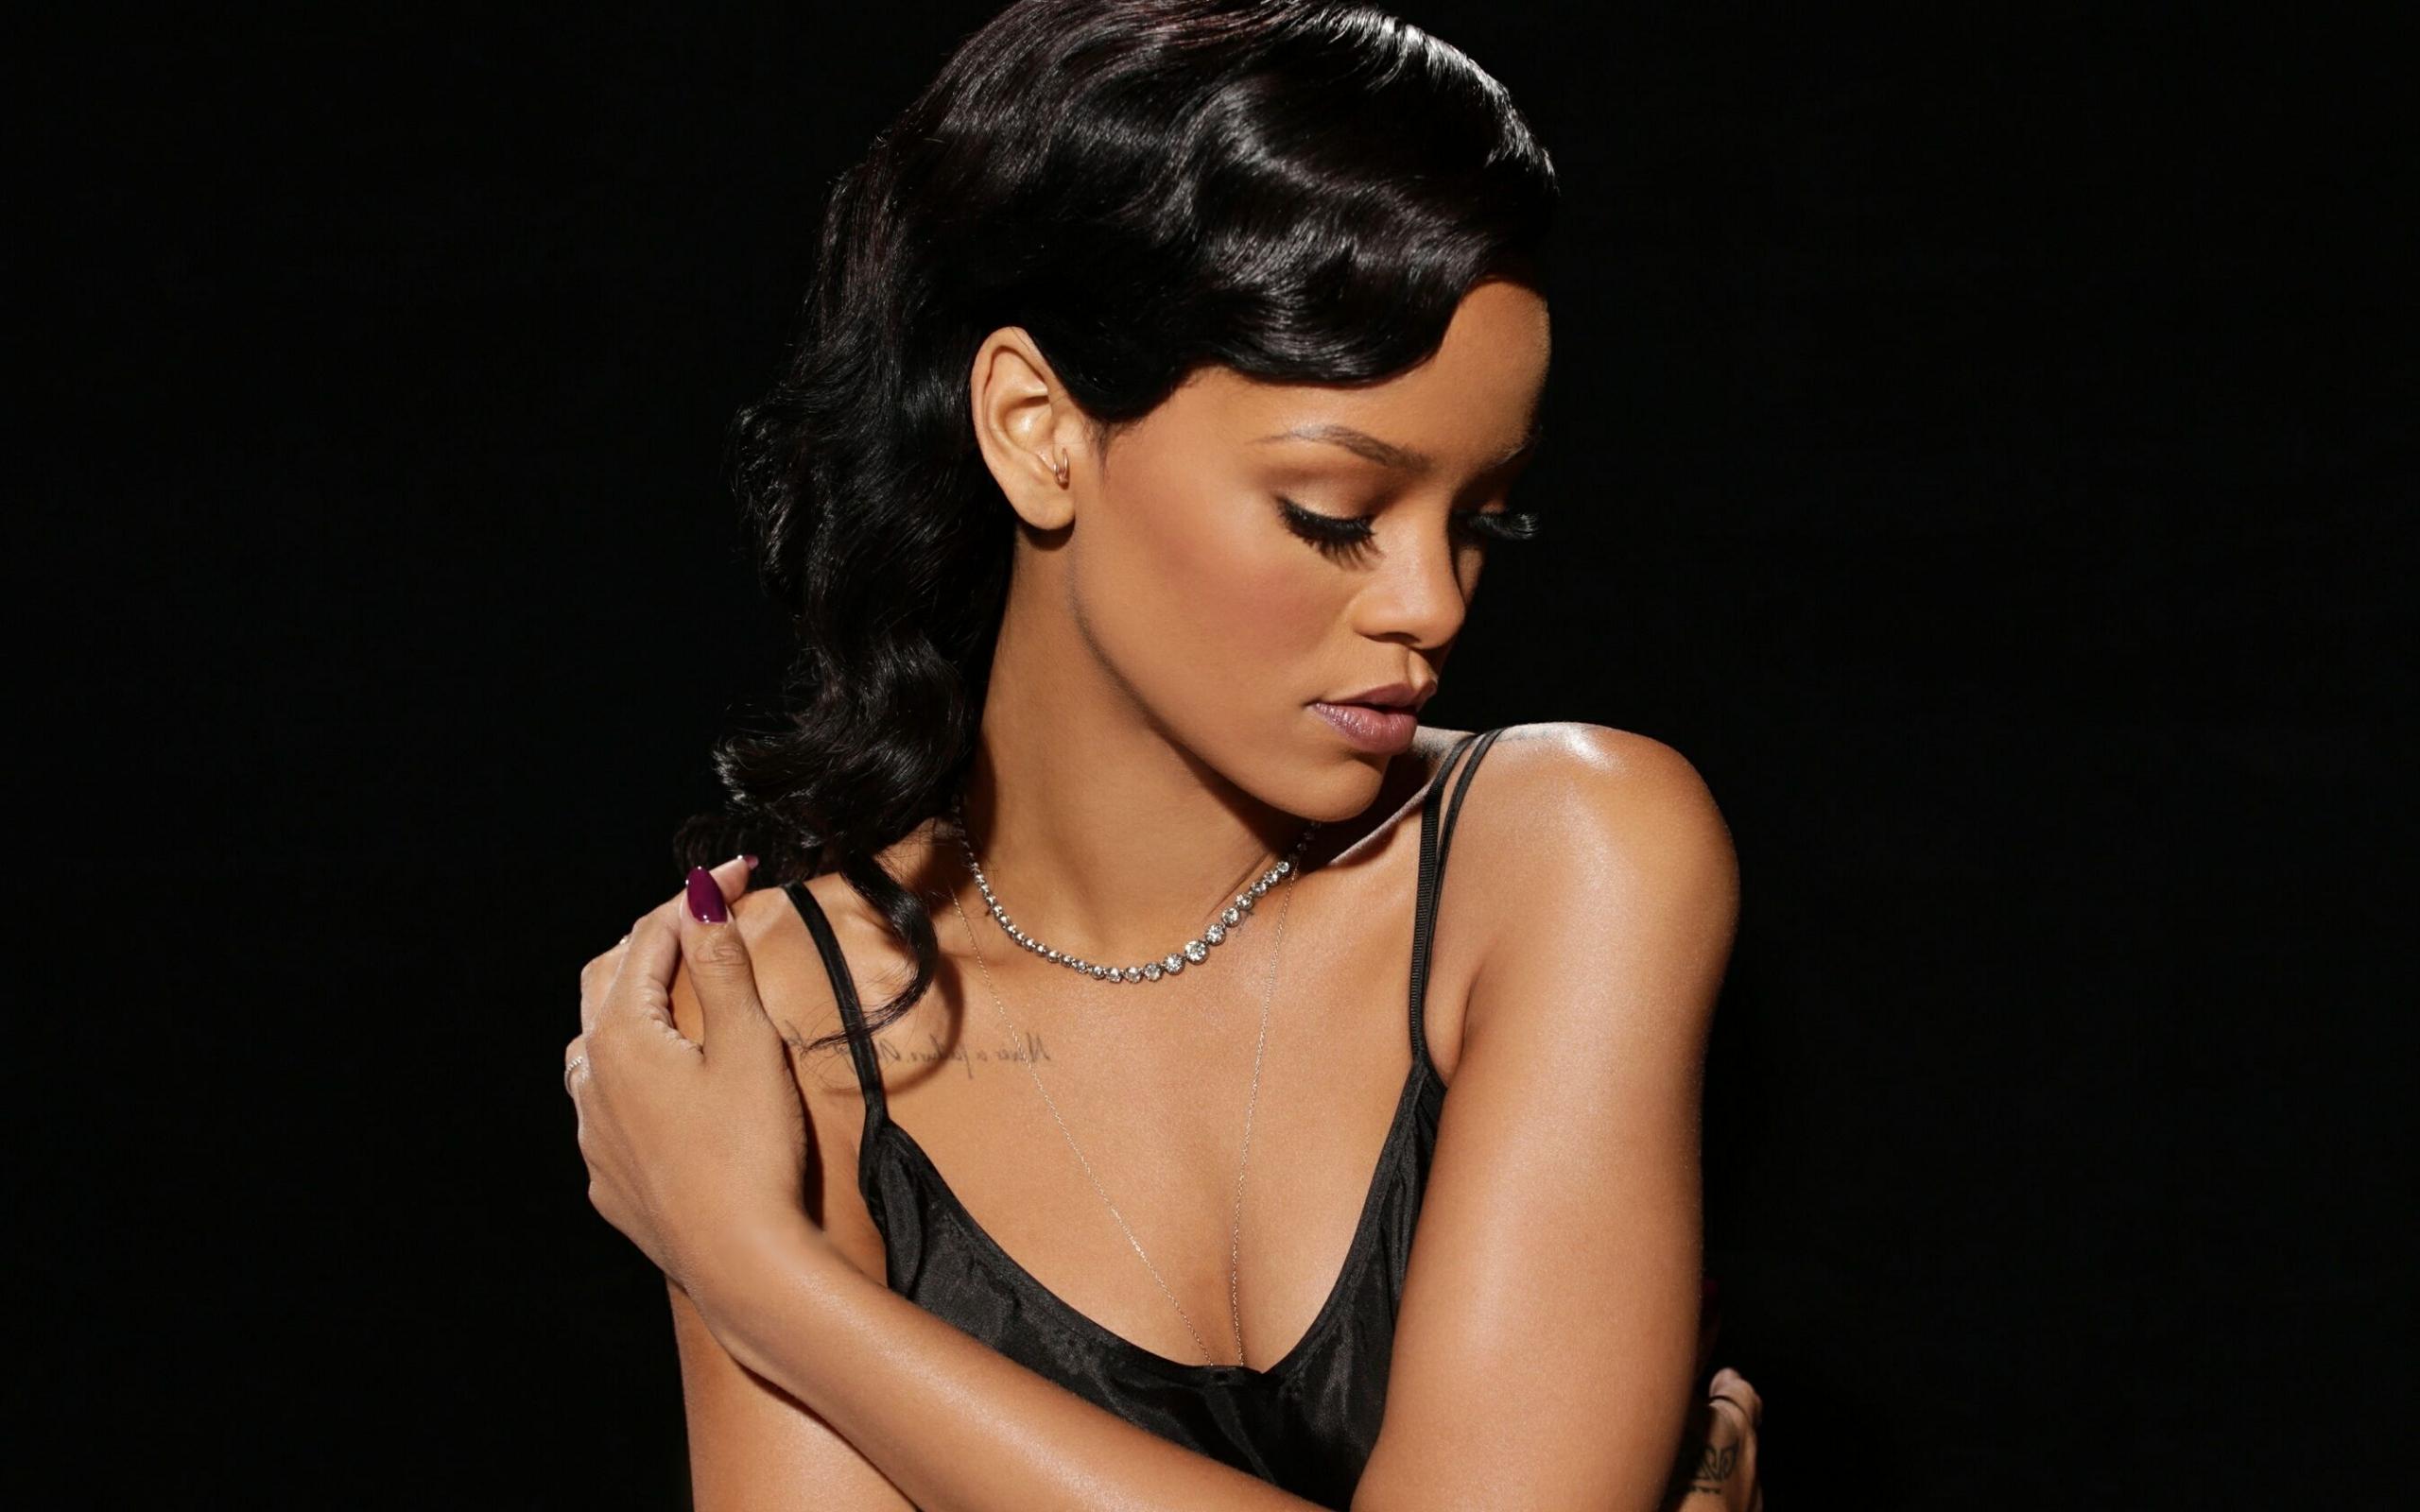 Rihanna 32 high resolution wallpaper hot celebrities wallpapers rihanna 32 high resolution wallpaper voltagebd Images